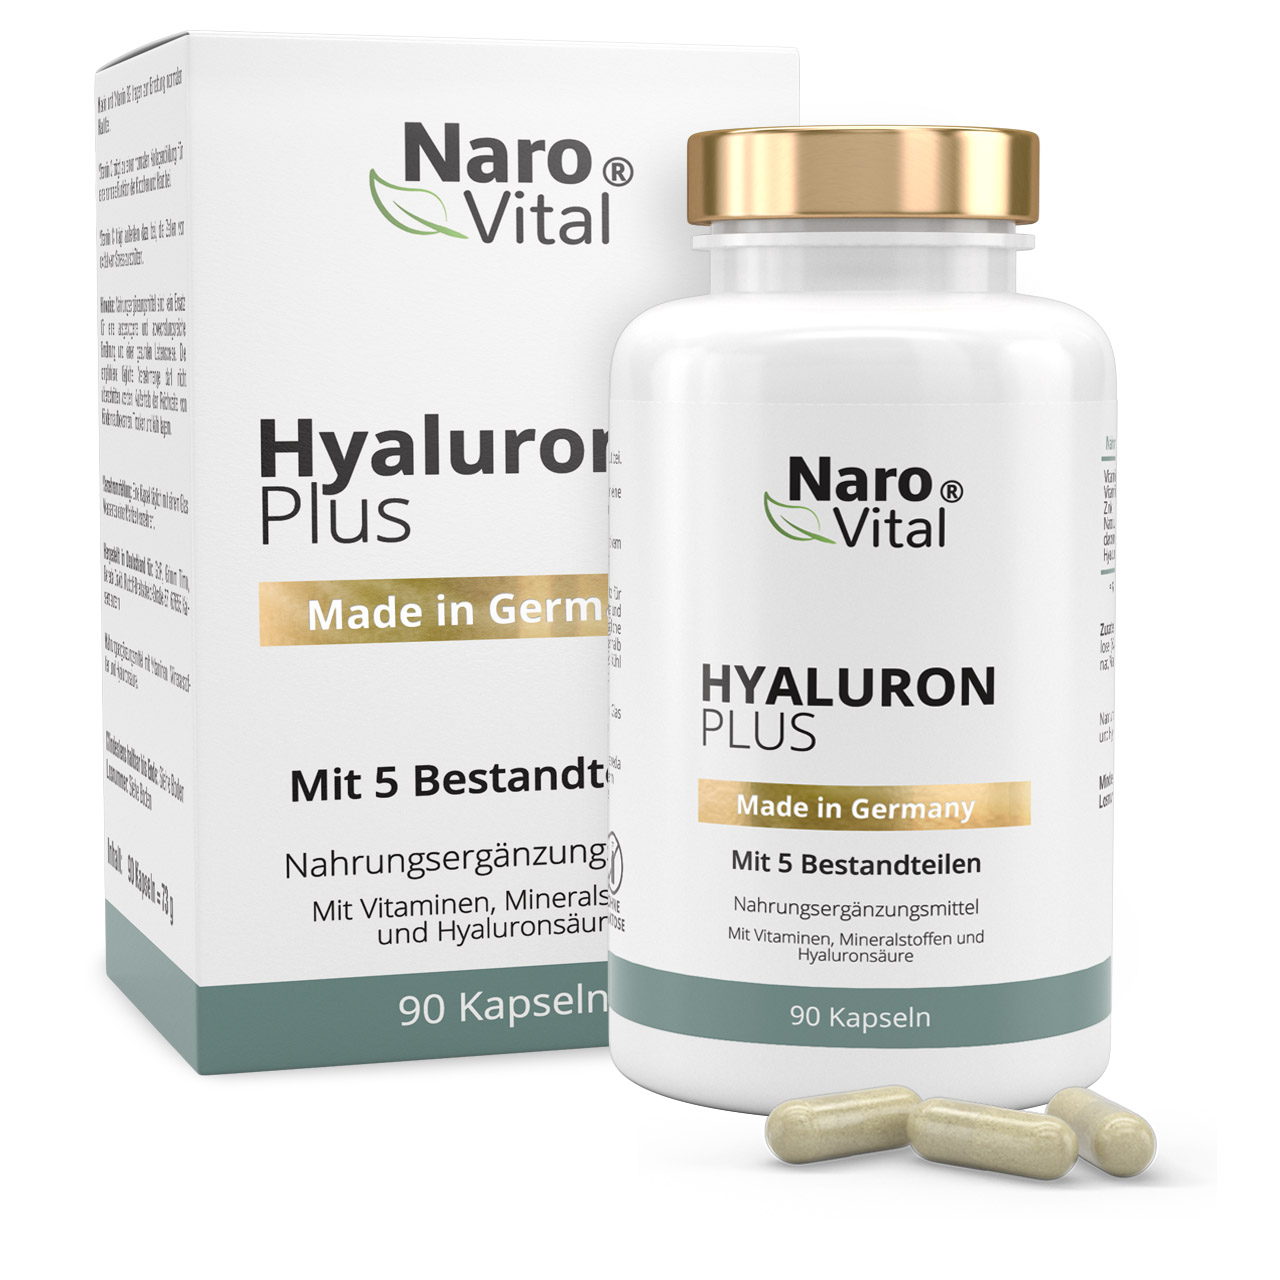 Hyaluron Plus – Anti-Aging & Gelenke